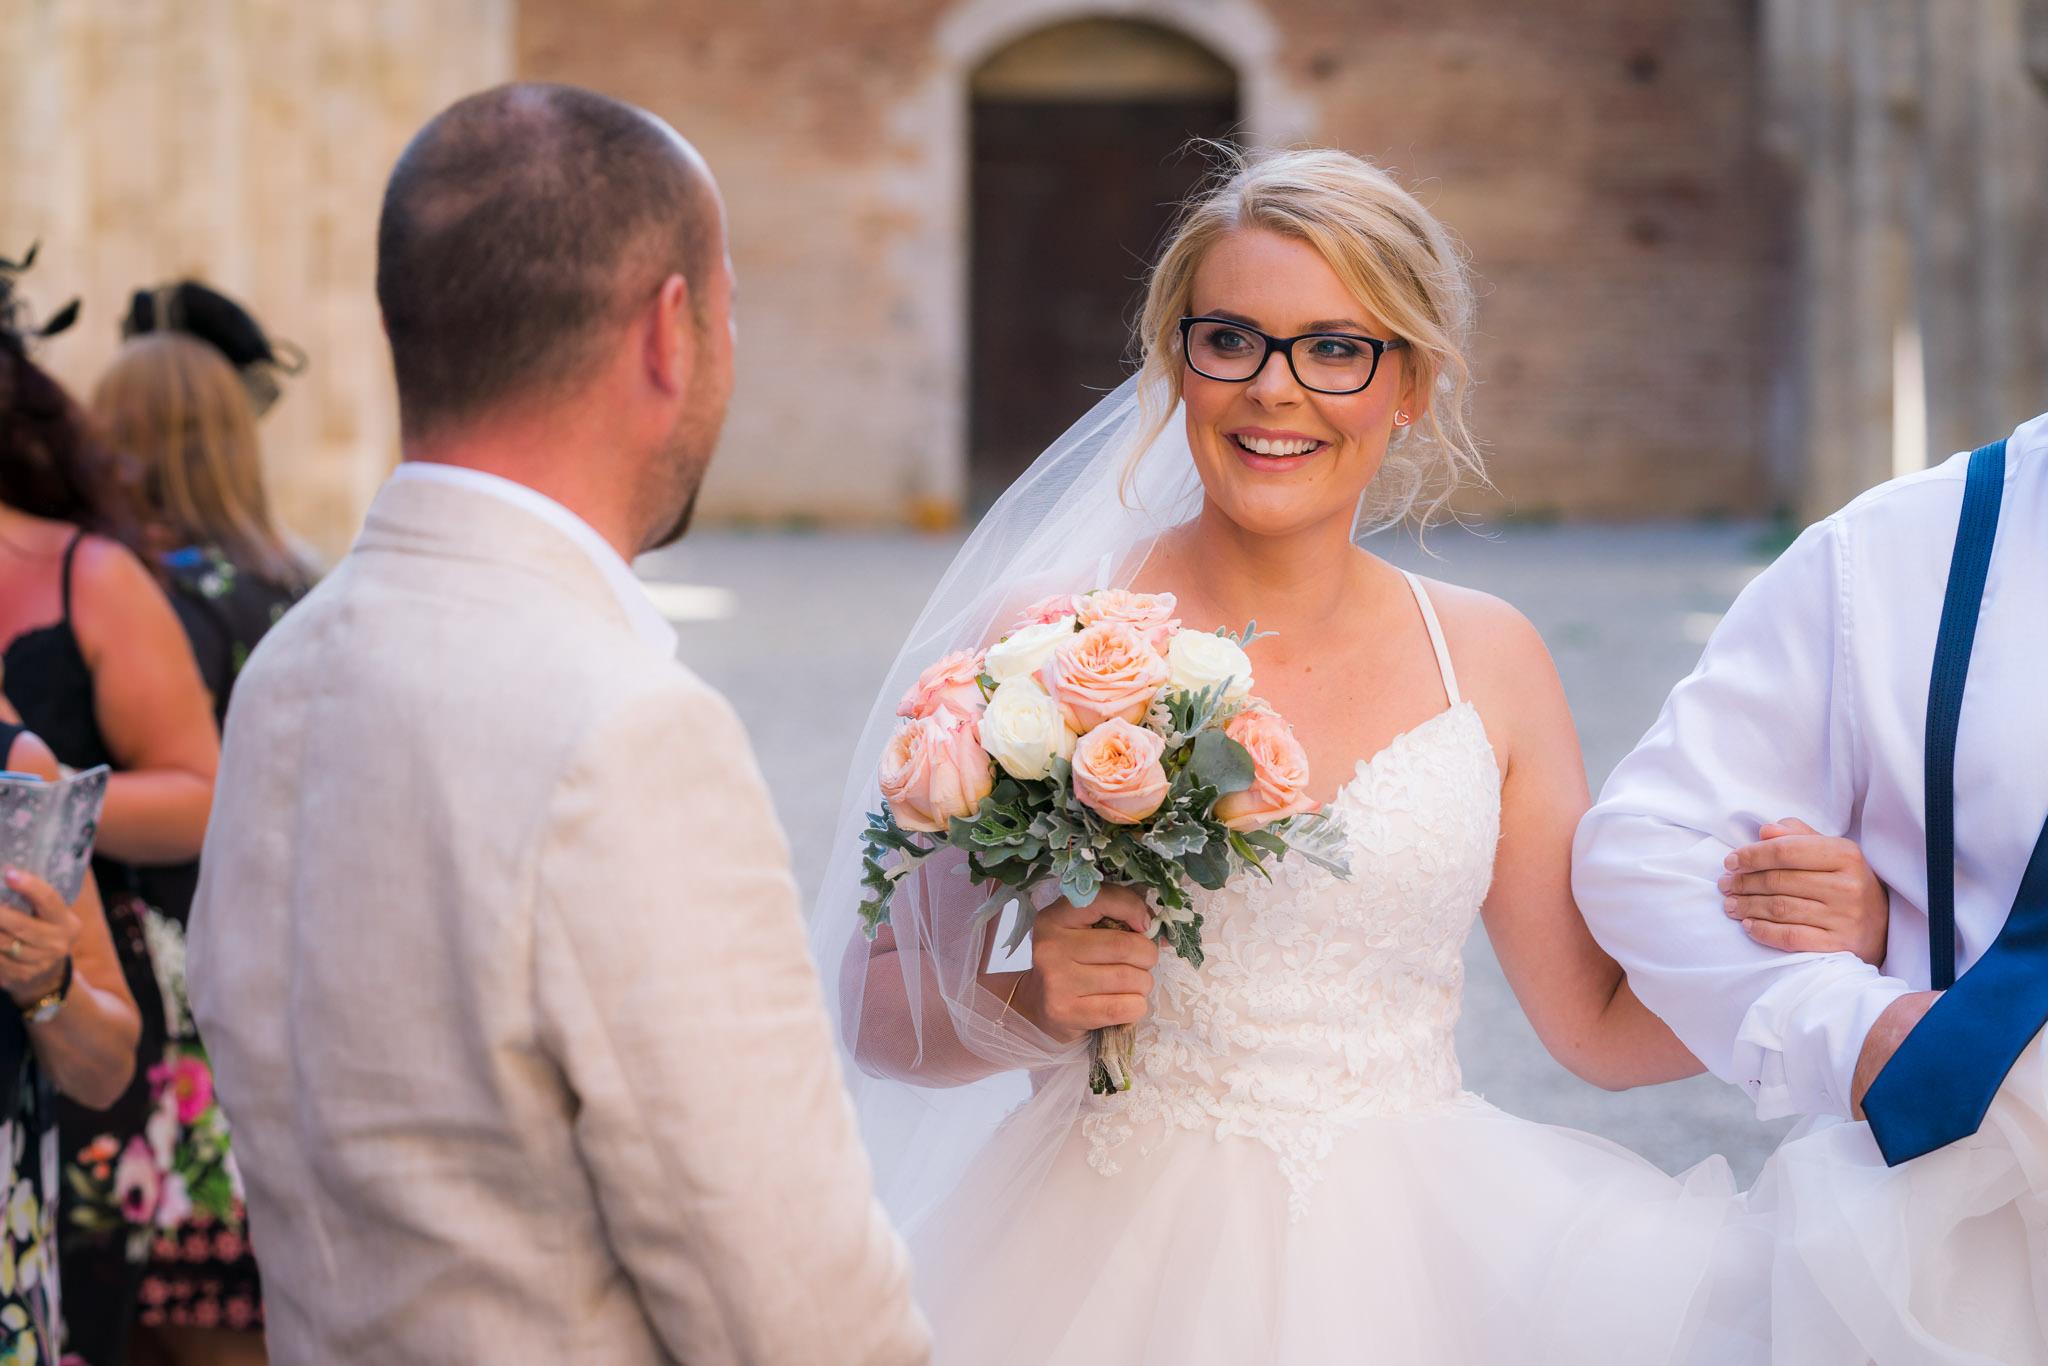 NC-2018-09-07_gemma-and-steve-wedding-1302.jpg